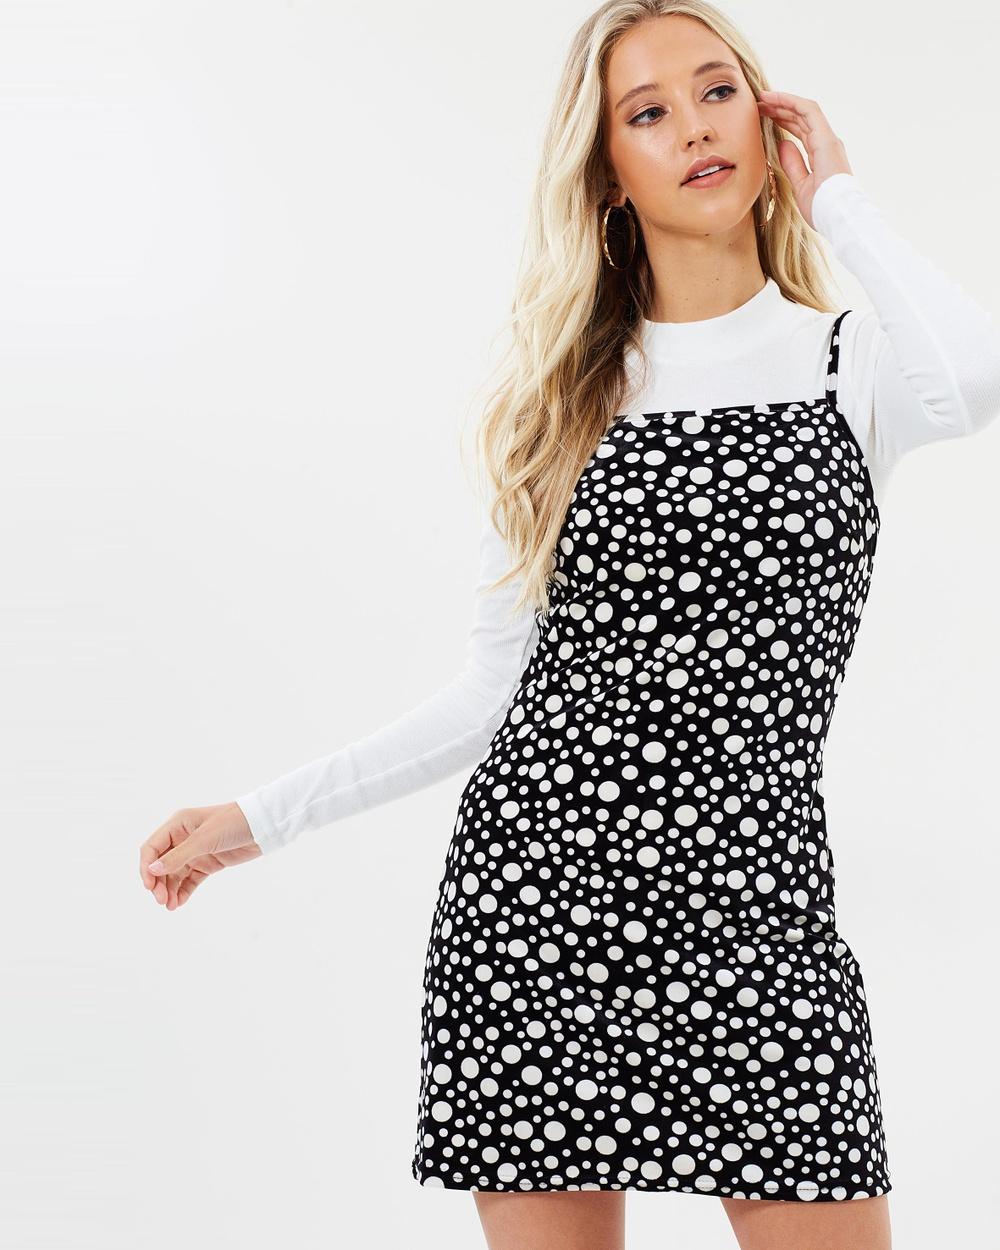 Dazie Penny Polka Velvet Dress Printed Dresses Black Spot Penny Polka Velvet Dress